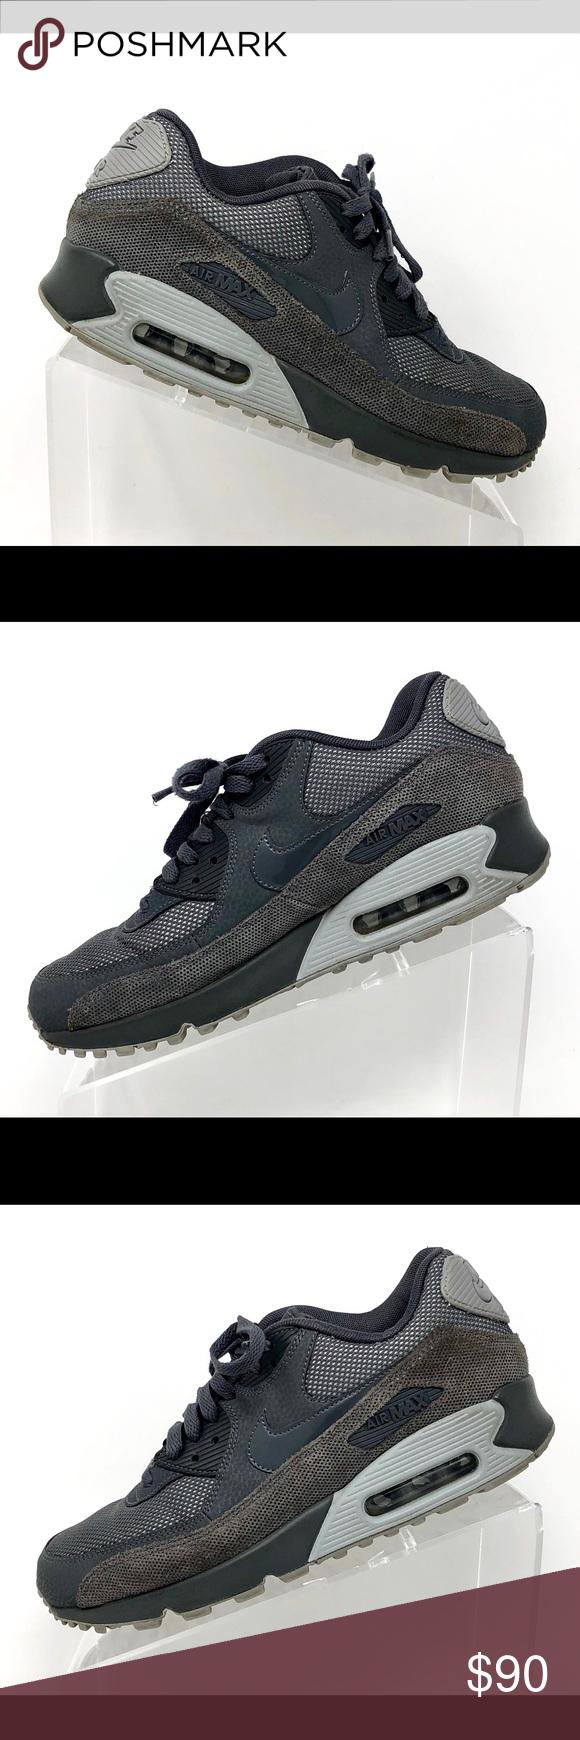 vente chaude en ligne 284f7 b7503 Nike Air Max 90 Premium Running Shoes Brand- Nike. Style ...